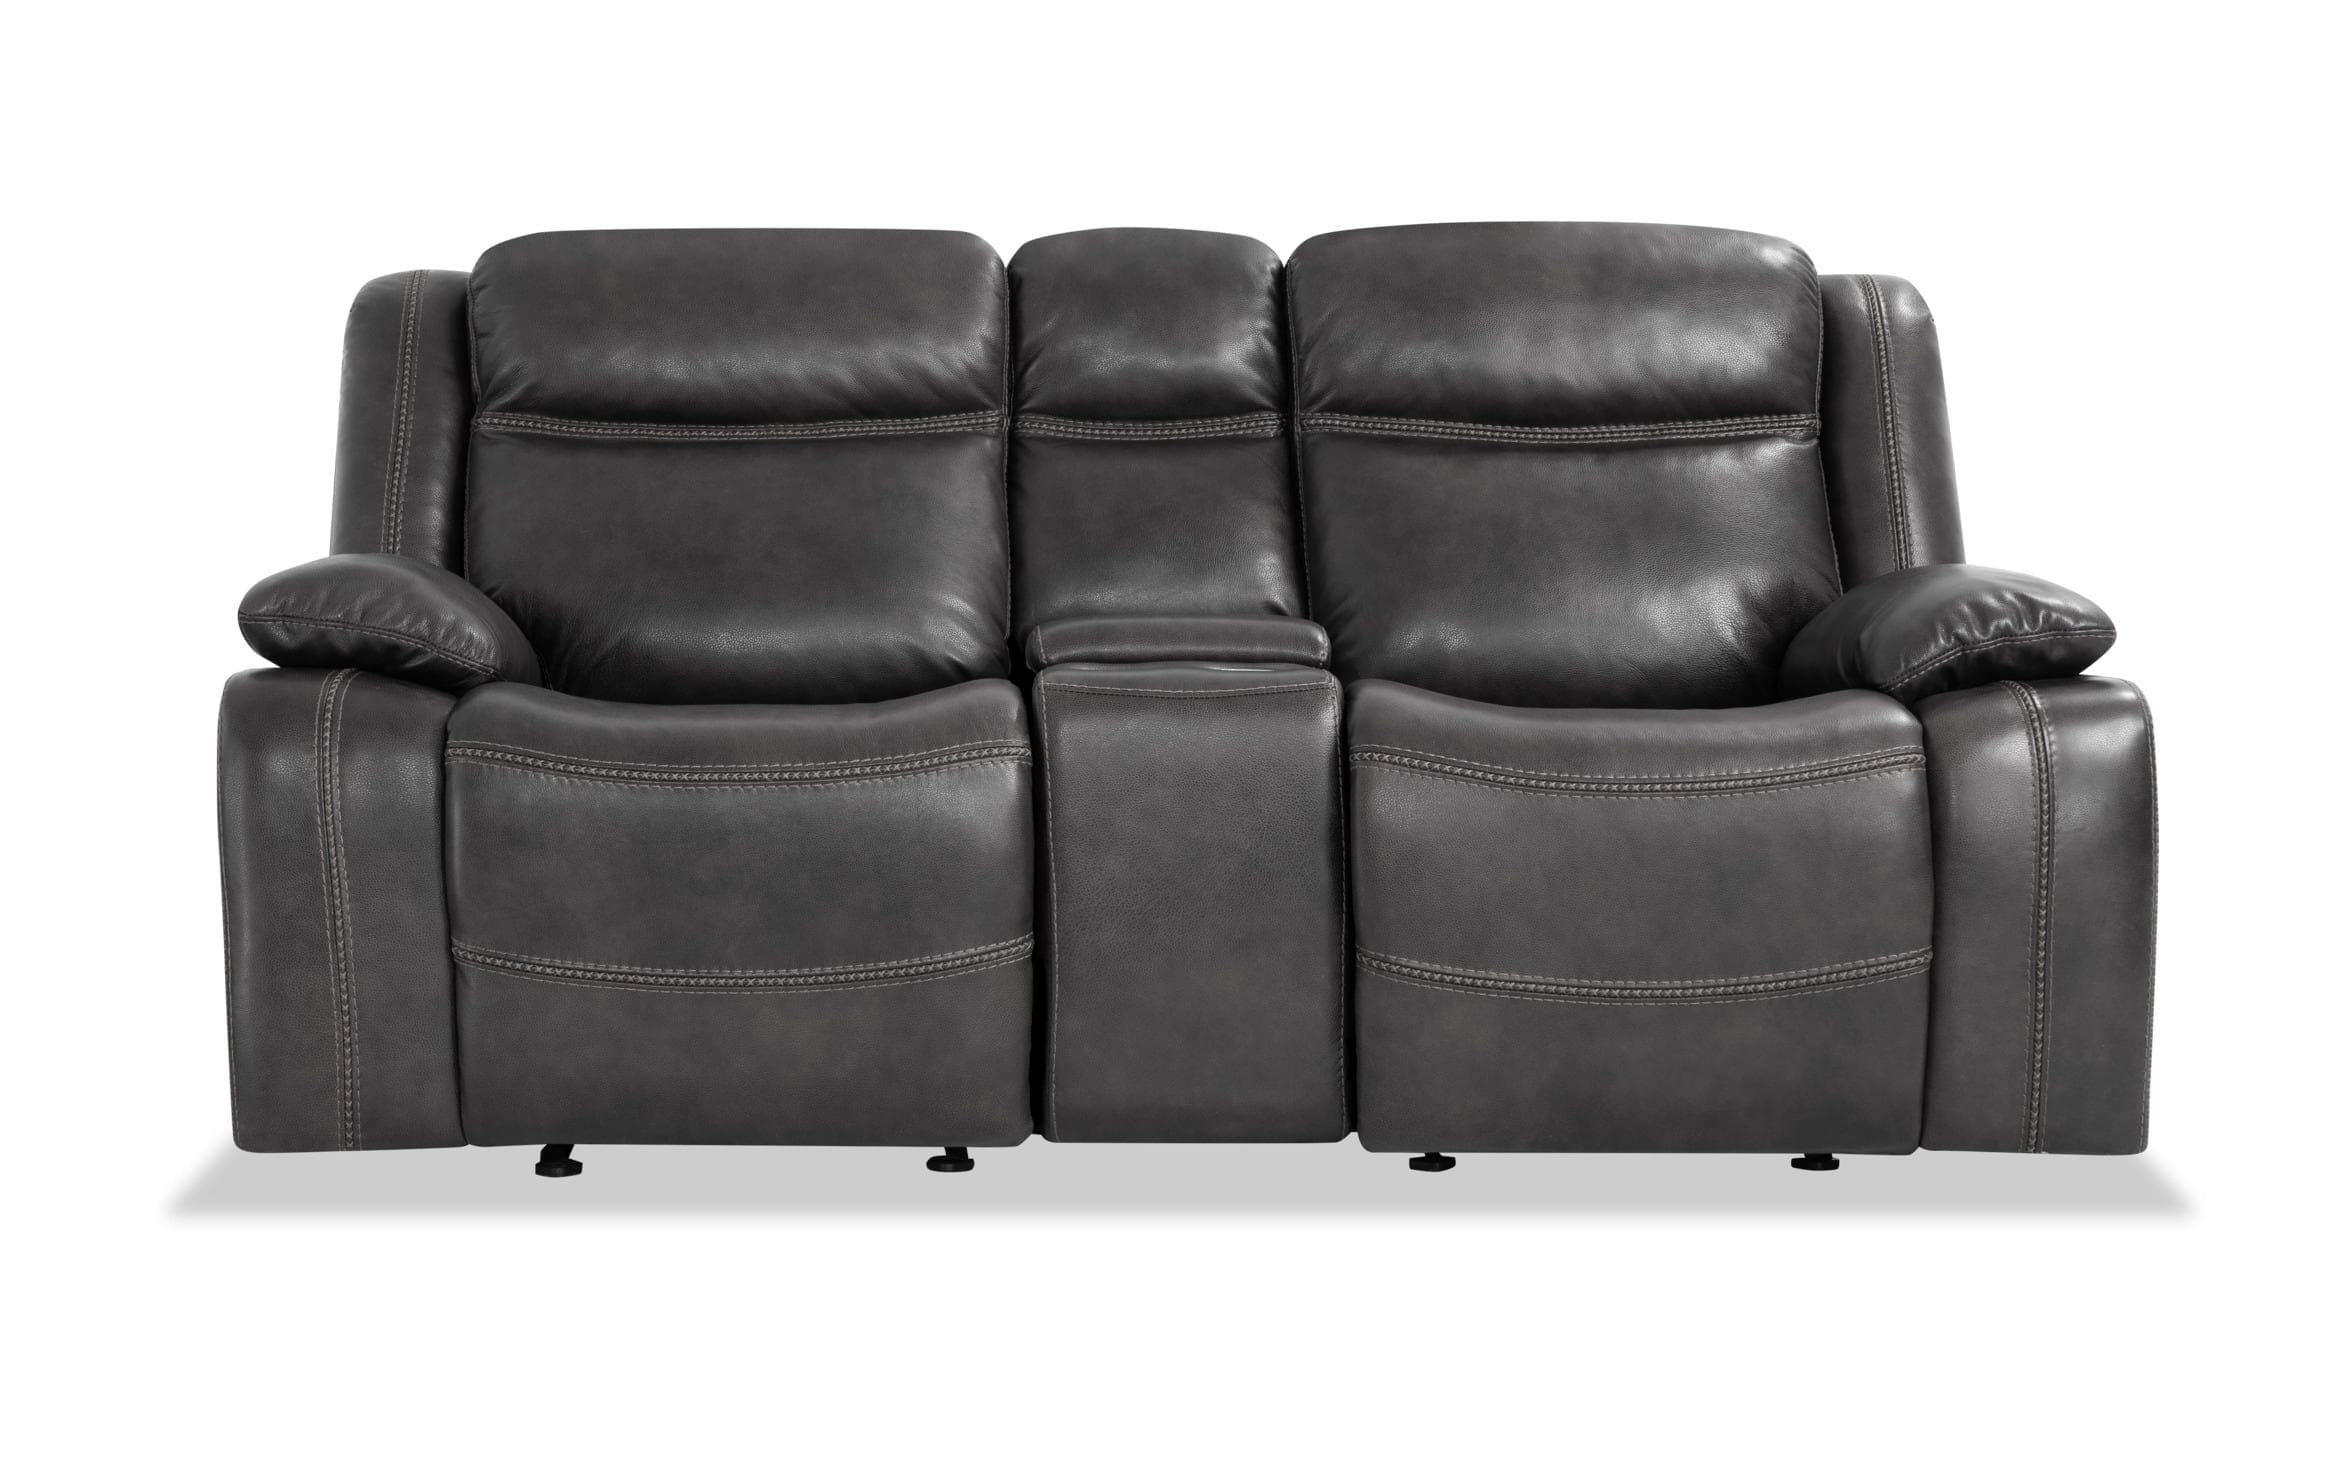 Olympus Gray Leather Power Reclining Loveseat Bob S Regarding Trailblazer Gray Leather Power Reclining Sofas (View 1 of 15)